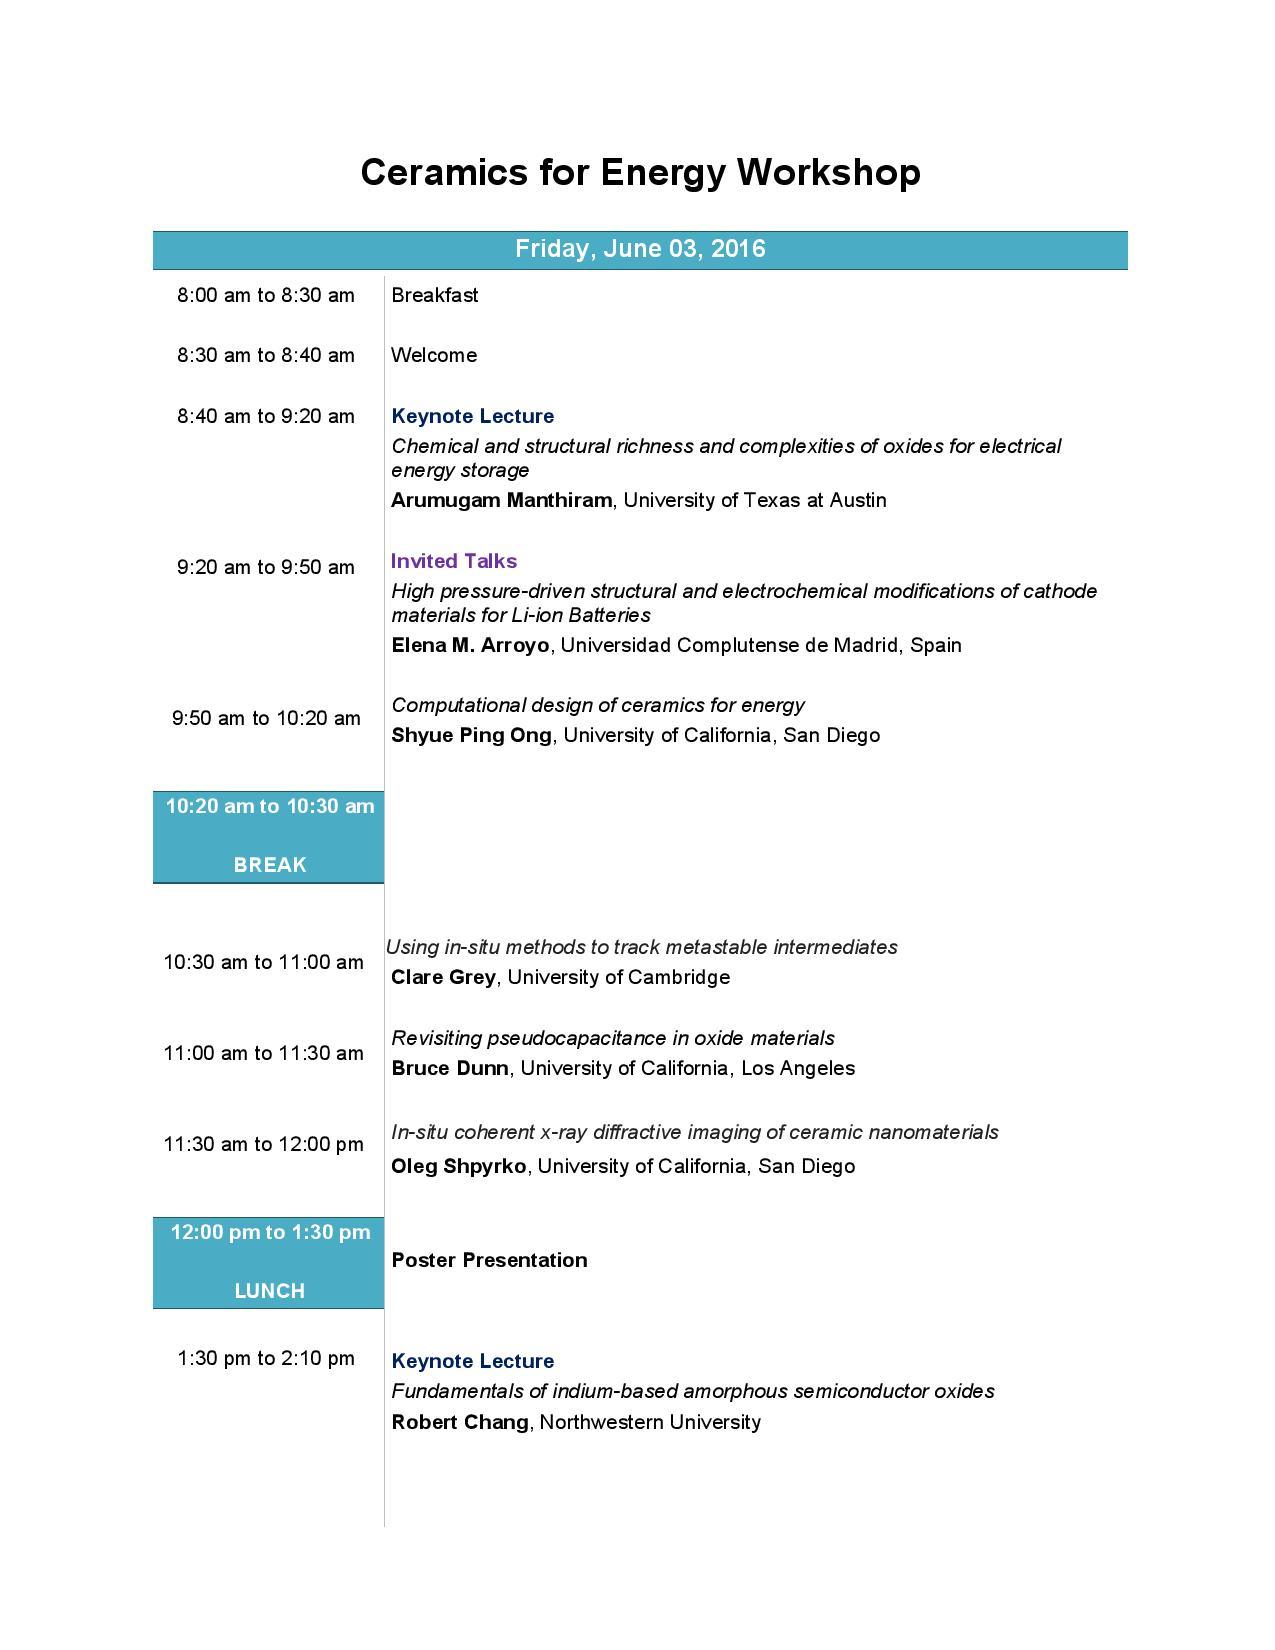 Ceramics for Energy Workshop Agenda Final-page-001